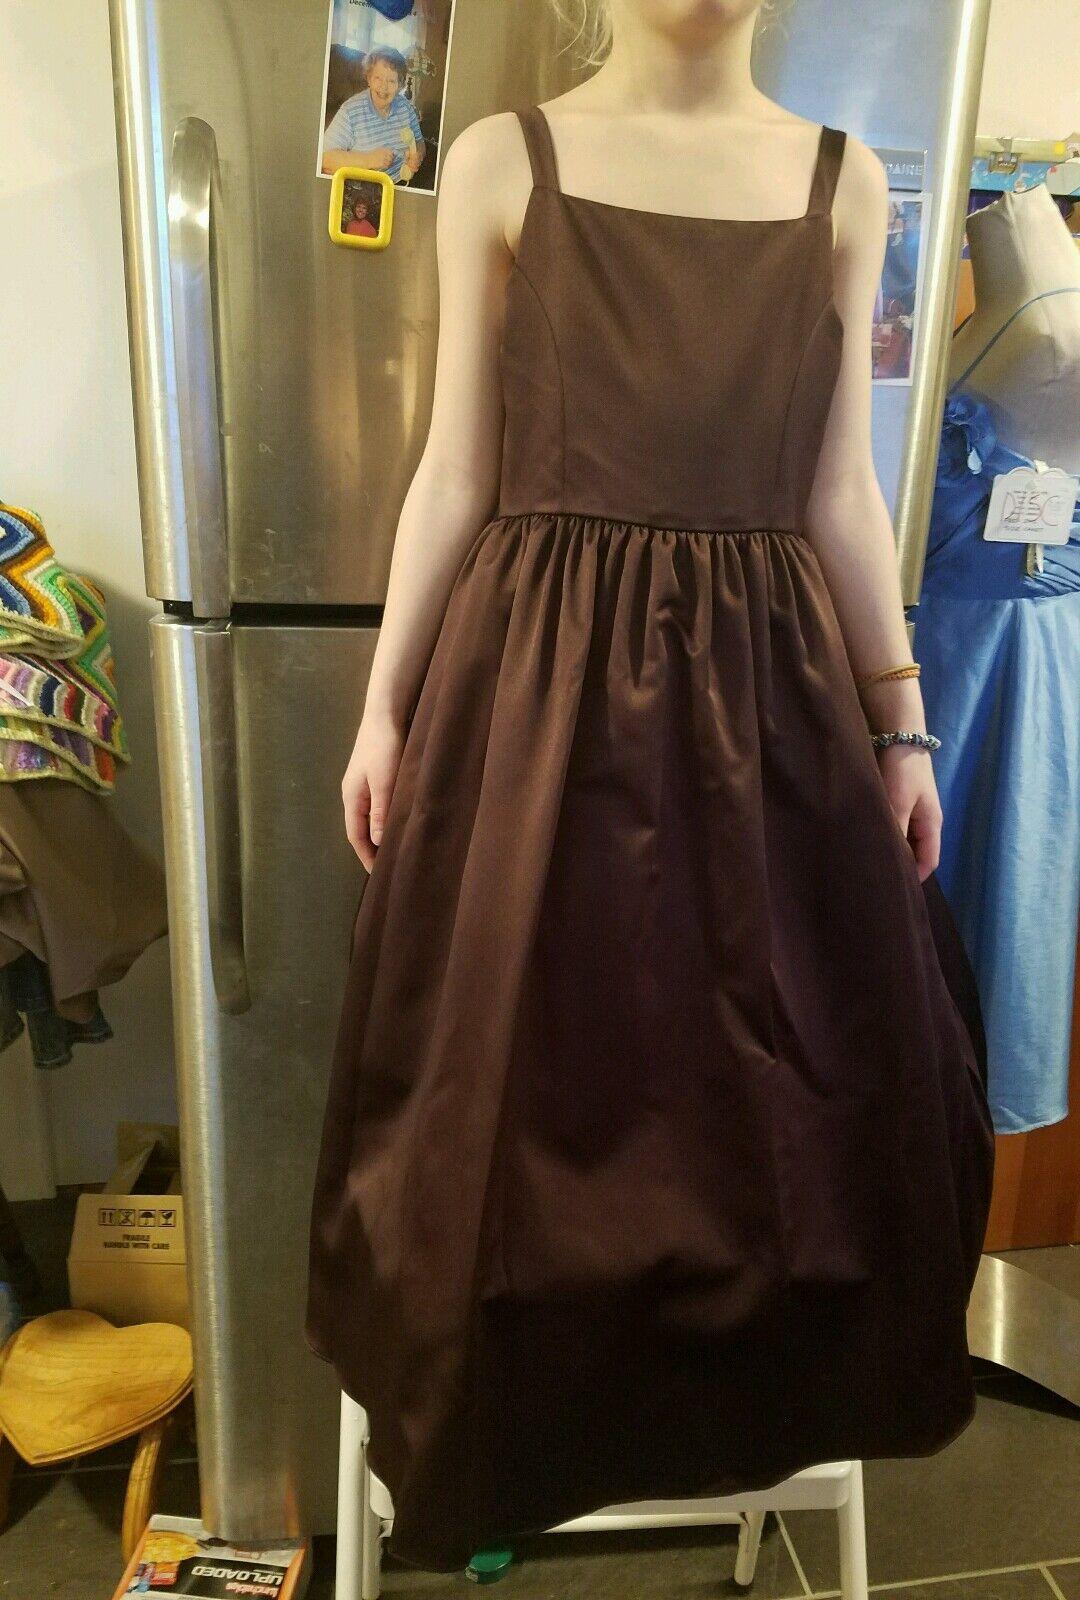 David's Bridal junior bridesmaid dress size 8 truffle sleebelss floor length sy